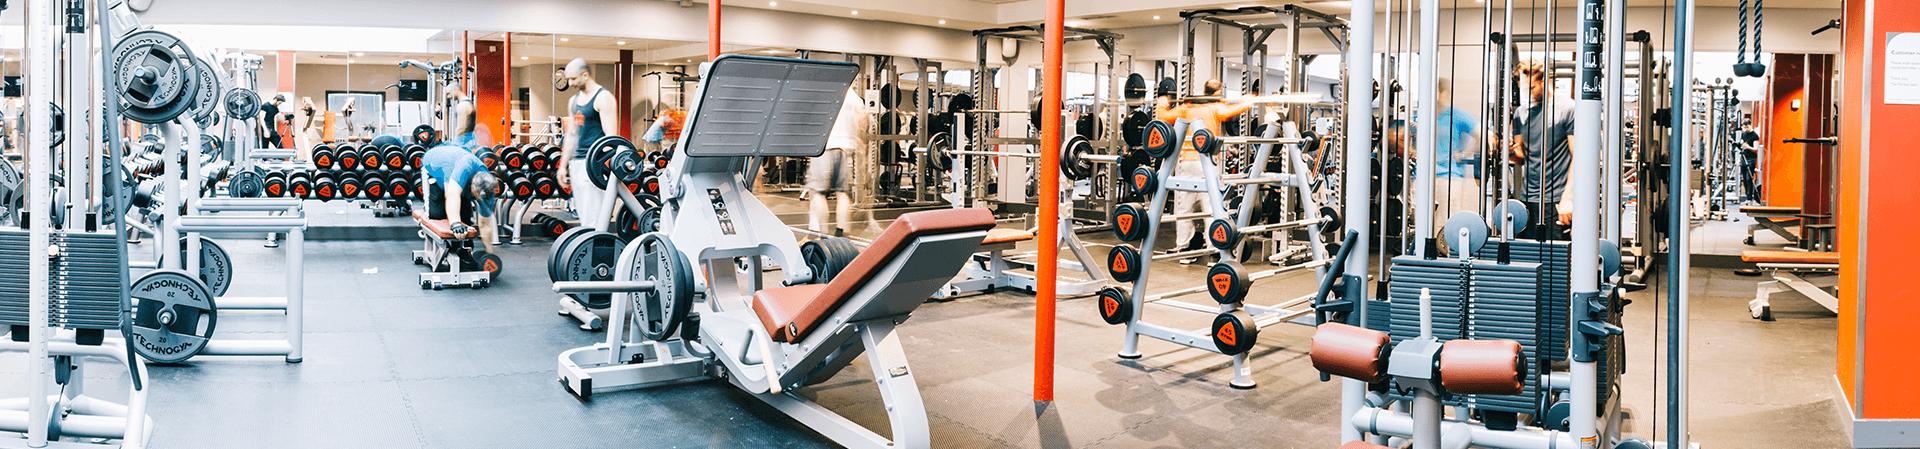 Gym at Porchester Centre